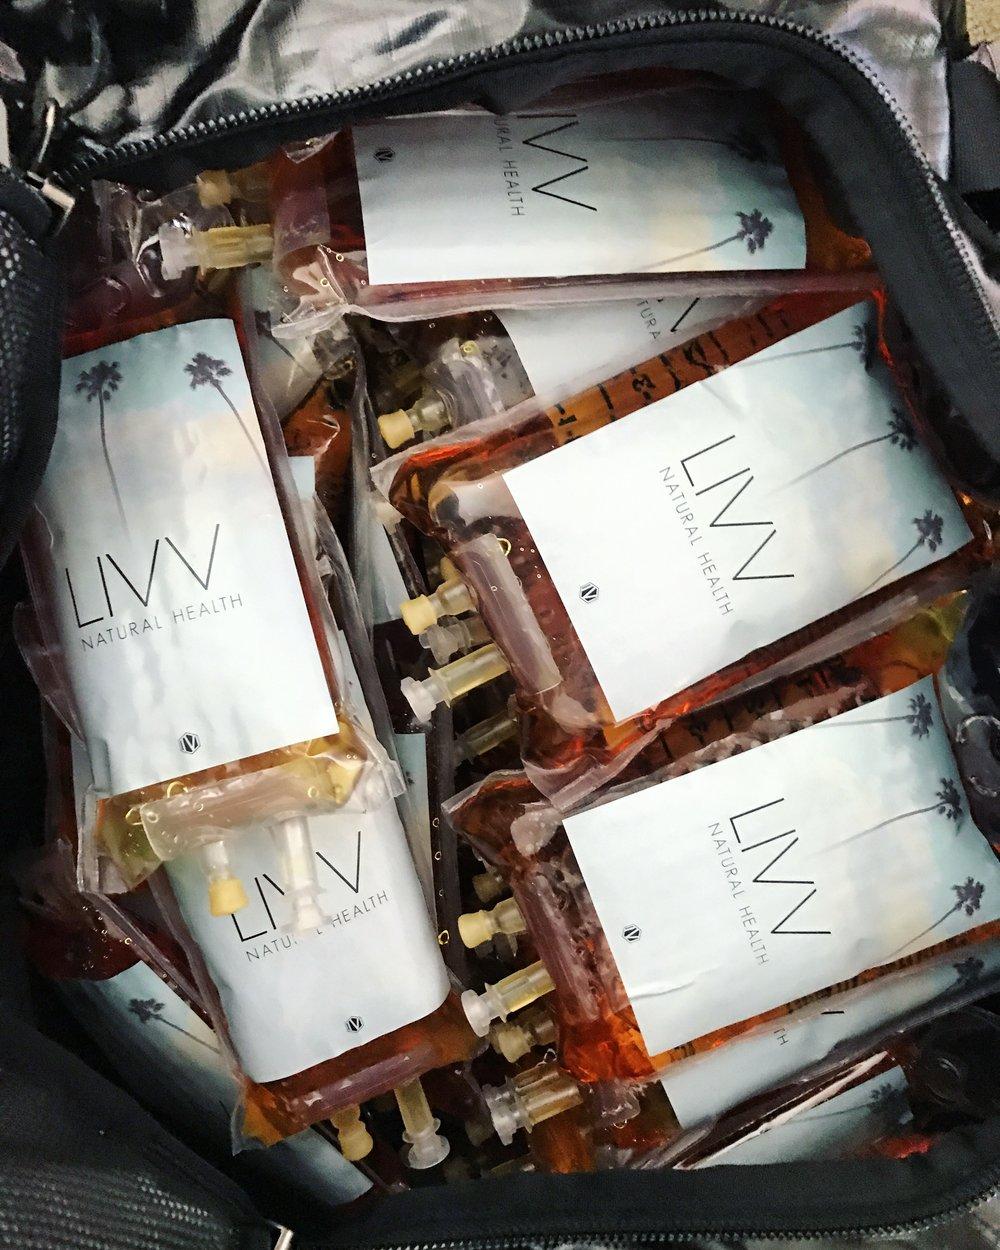 LIVV IV Hydration Events